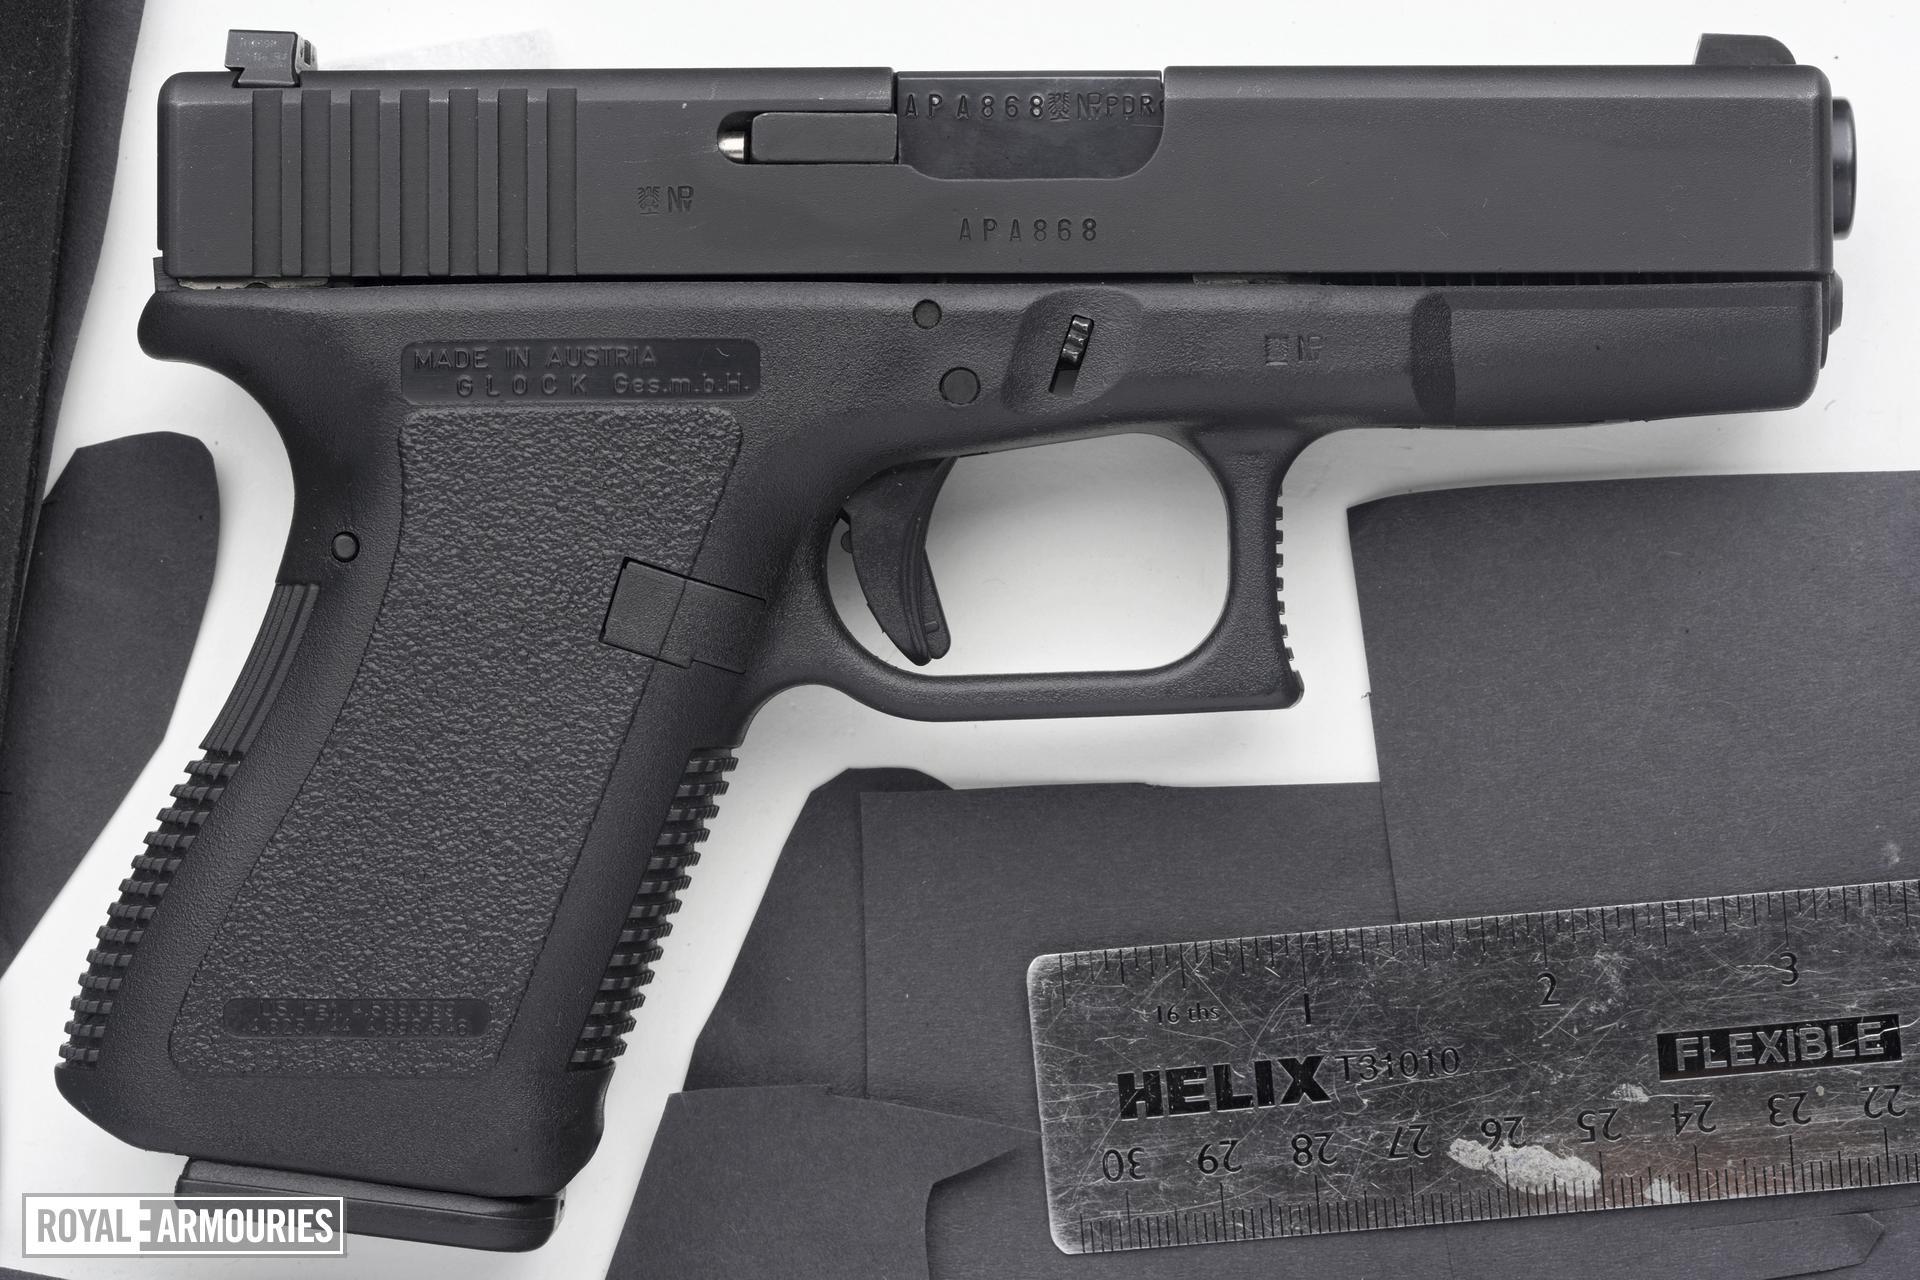 Centrefire self-loading pistol - Glock 23